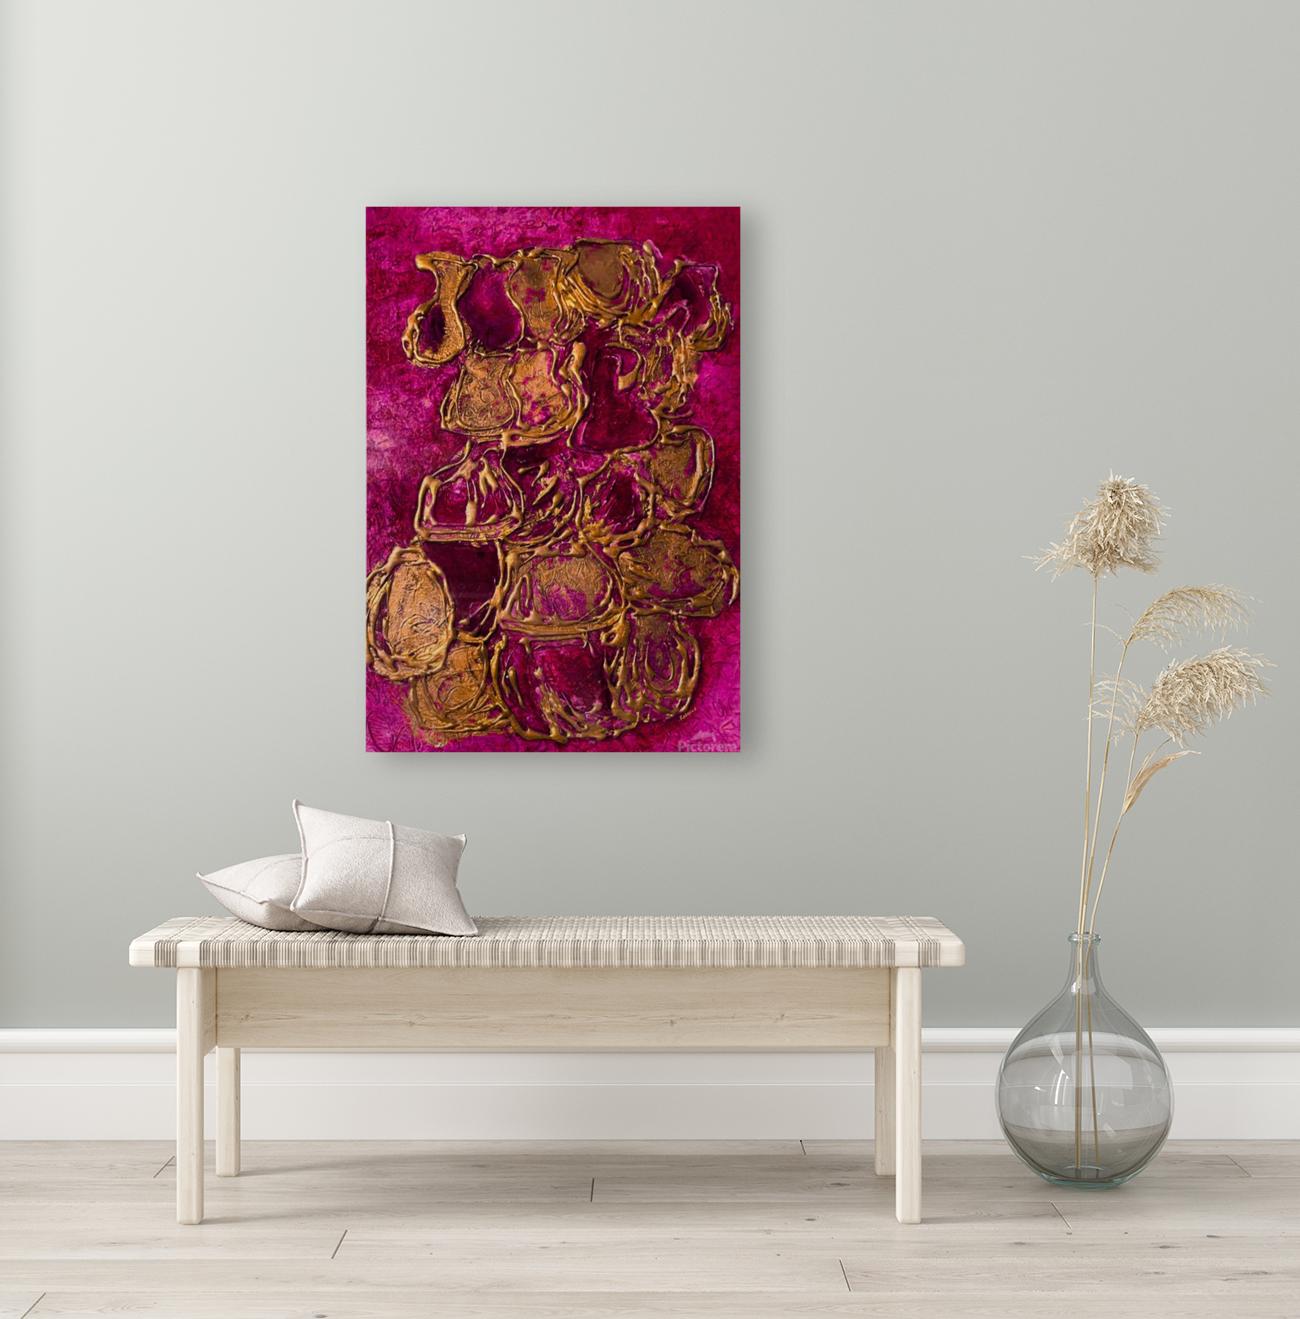 JARS - Original Abstract Acrylic Paint Printed on Canvas by: Rebecca Mangalindan  Art